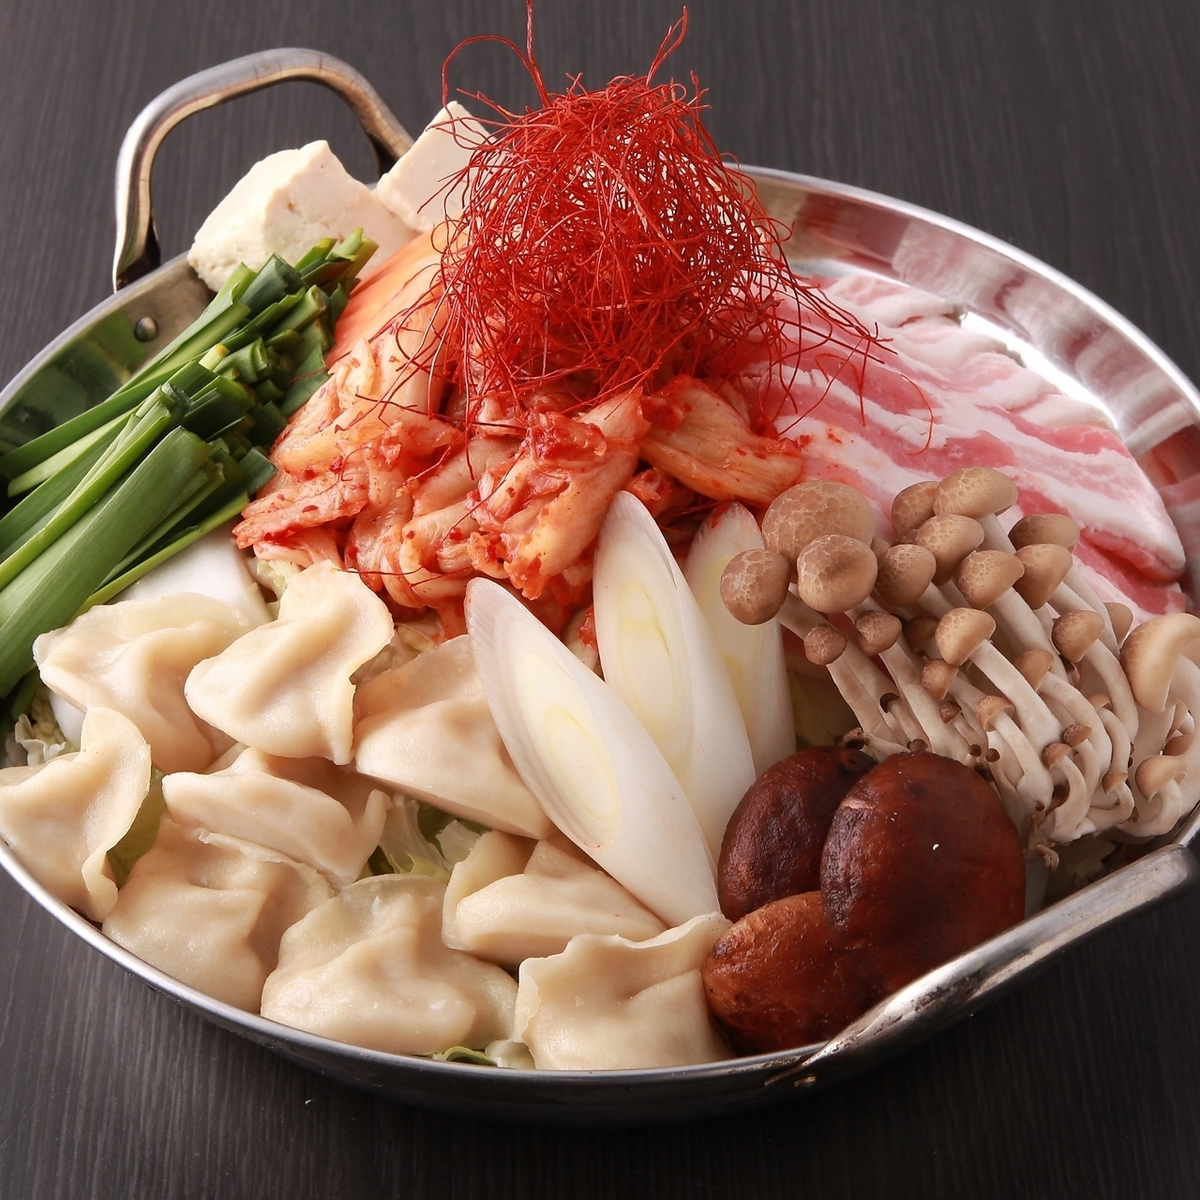 【Kanda Kawa Toshiro監督】Kuro豬餃子配馬辣泡菜火鍋